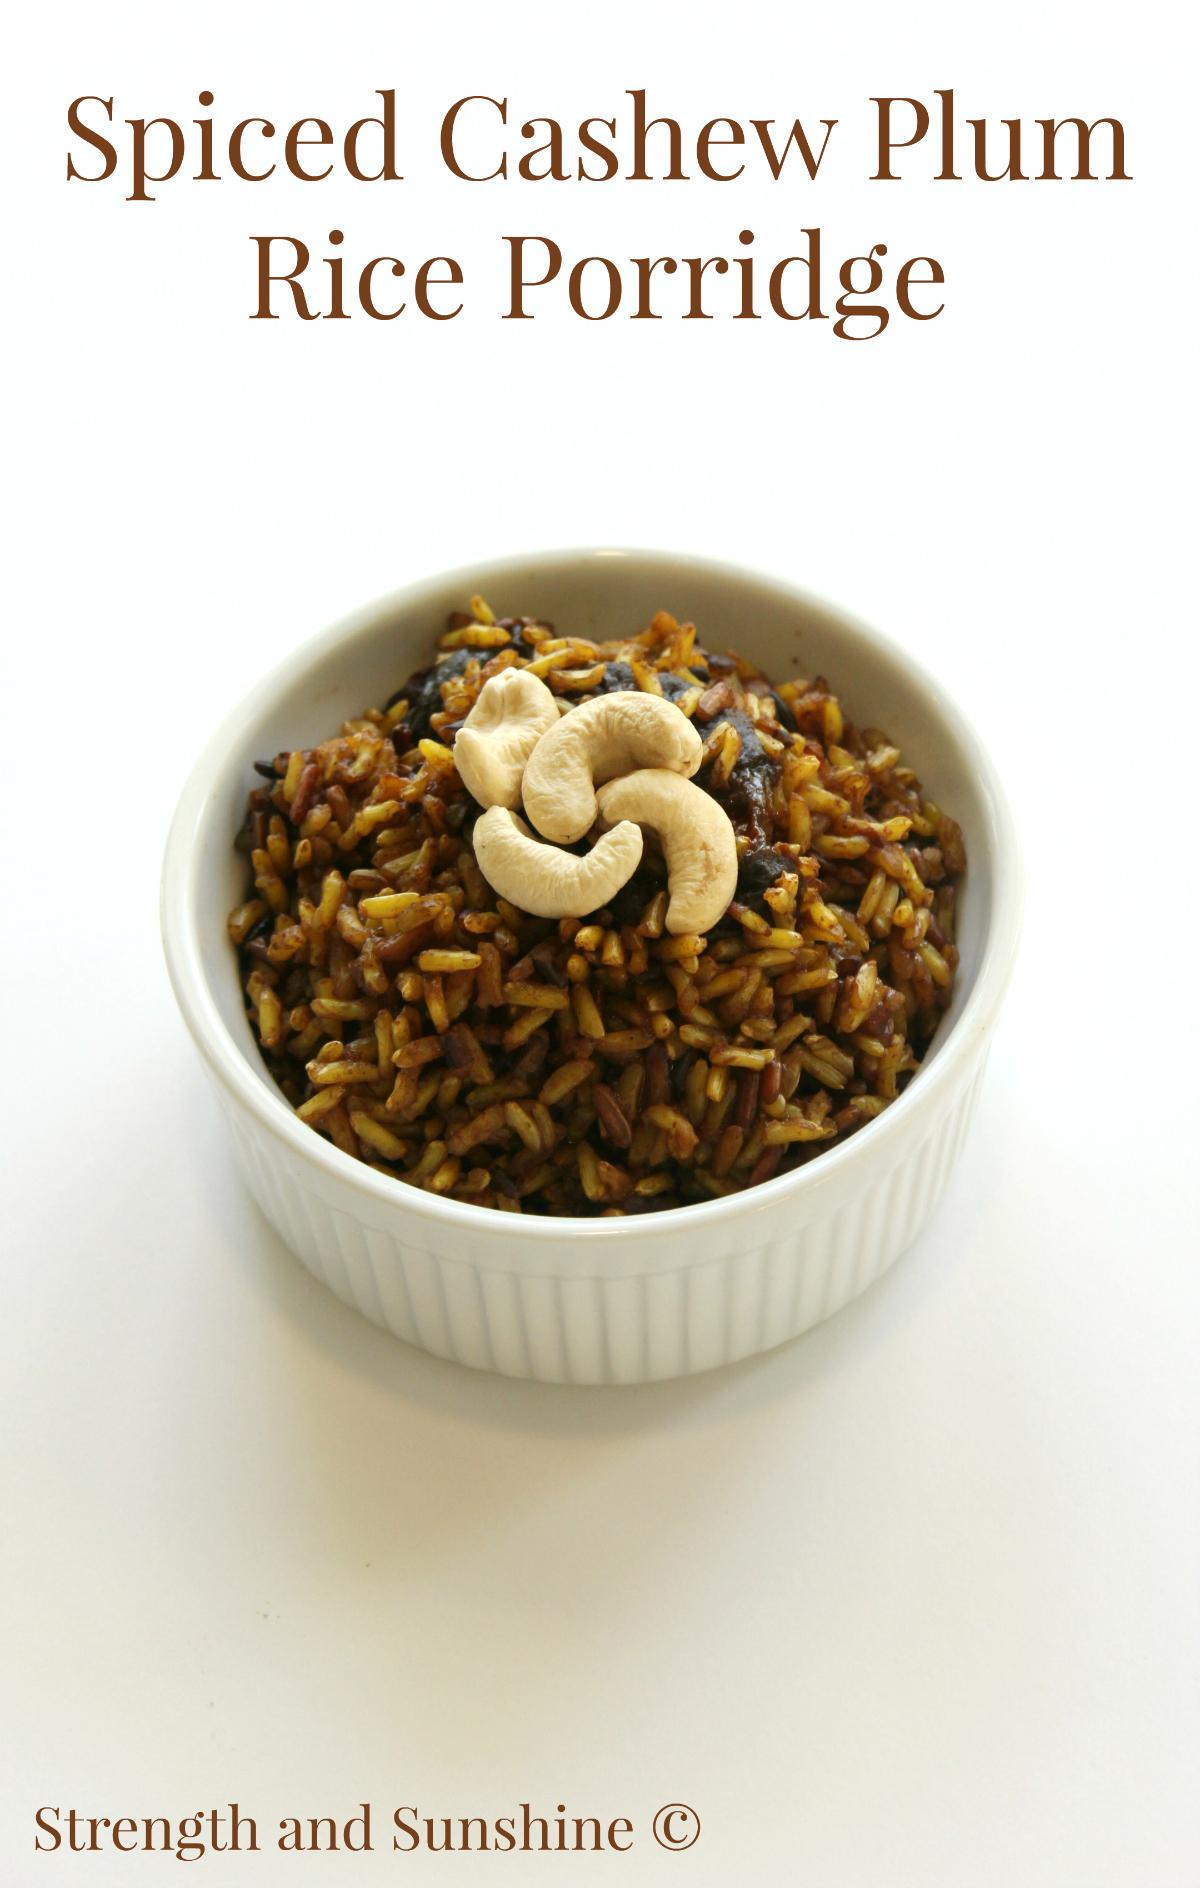 Spiced Cashew Plum Rice Porridge | Strength and Sunshine @RebeccaGF666 #breakfast #glutenfree #vegan #sponsored